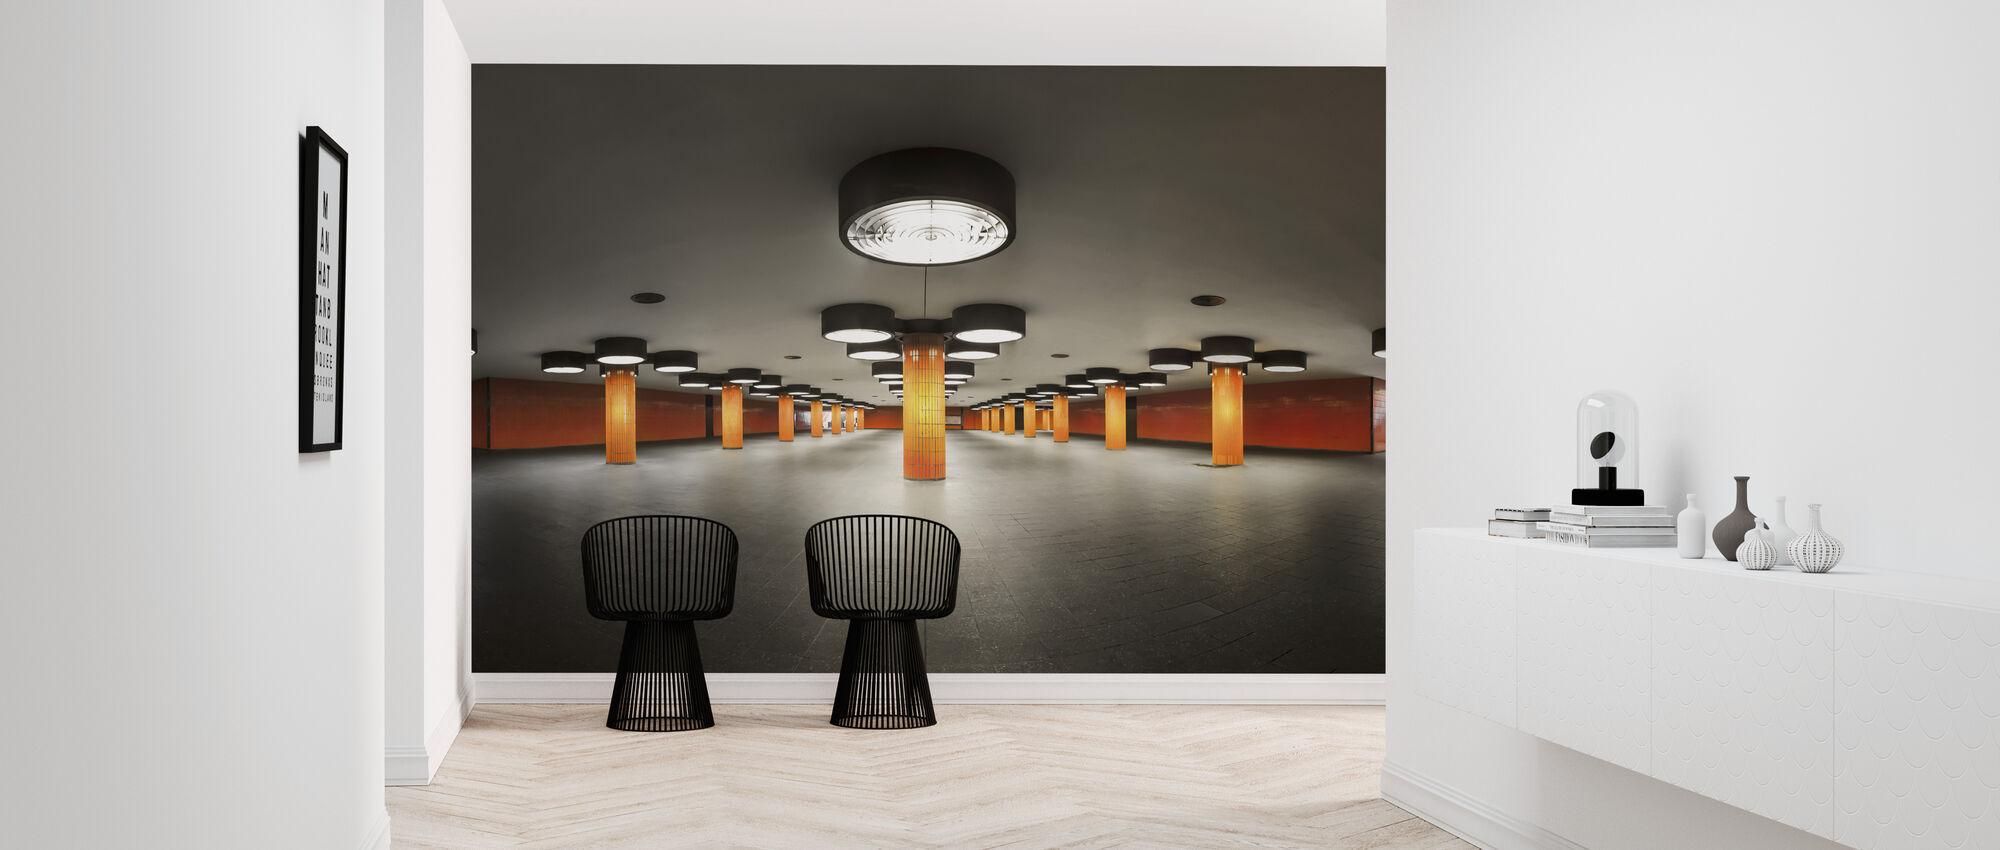 On stage - Wallpaper - Hallway